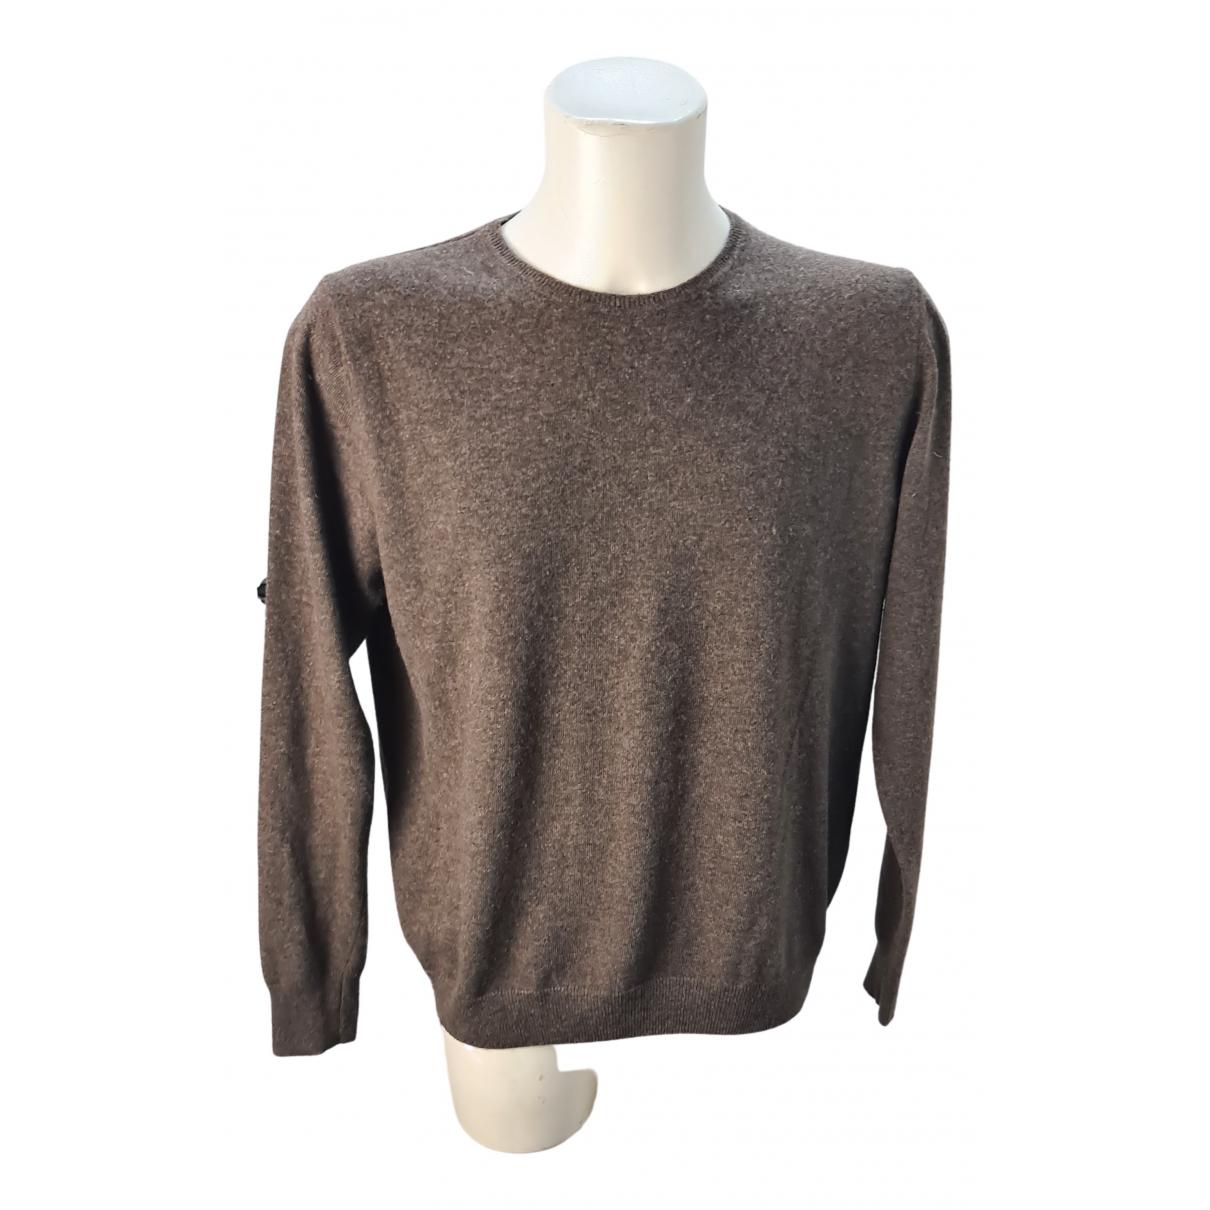 Liu.jo N Brown Cashmere Knitwear & Sweatshirts for Men XL International